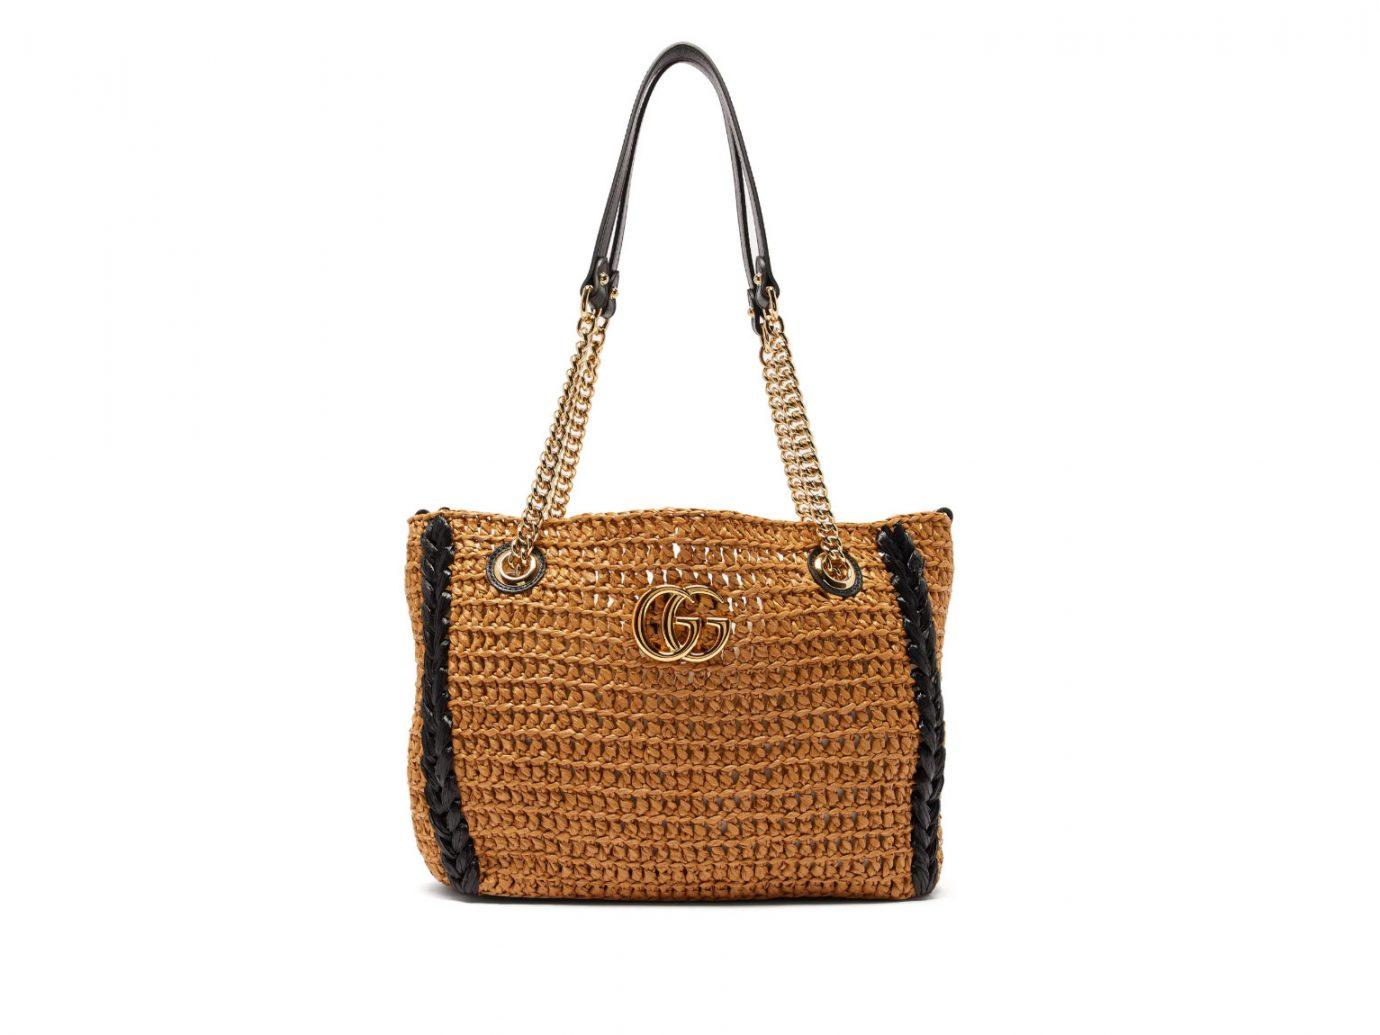 Gucci GG Marmont Woven Shoulder Bag